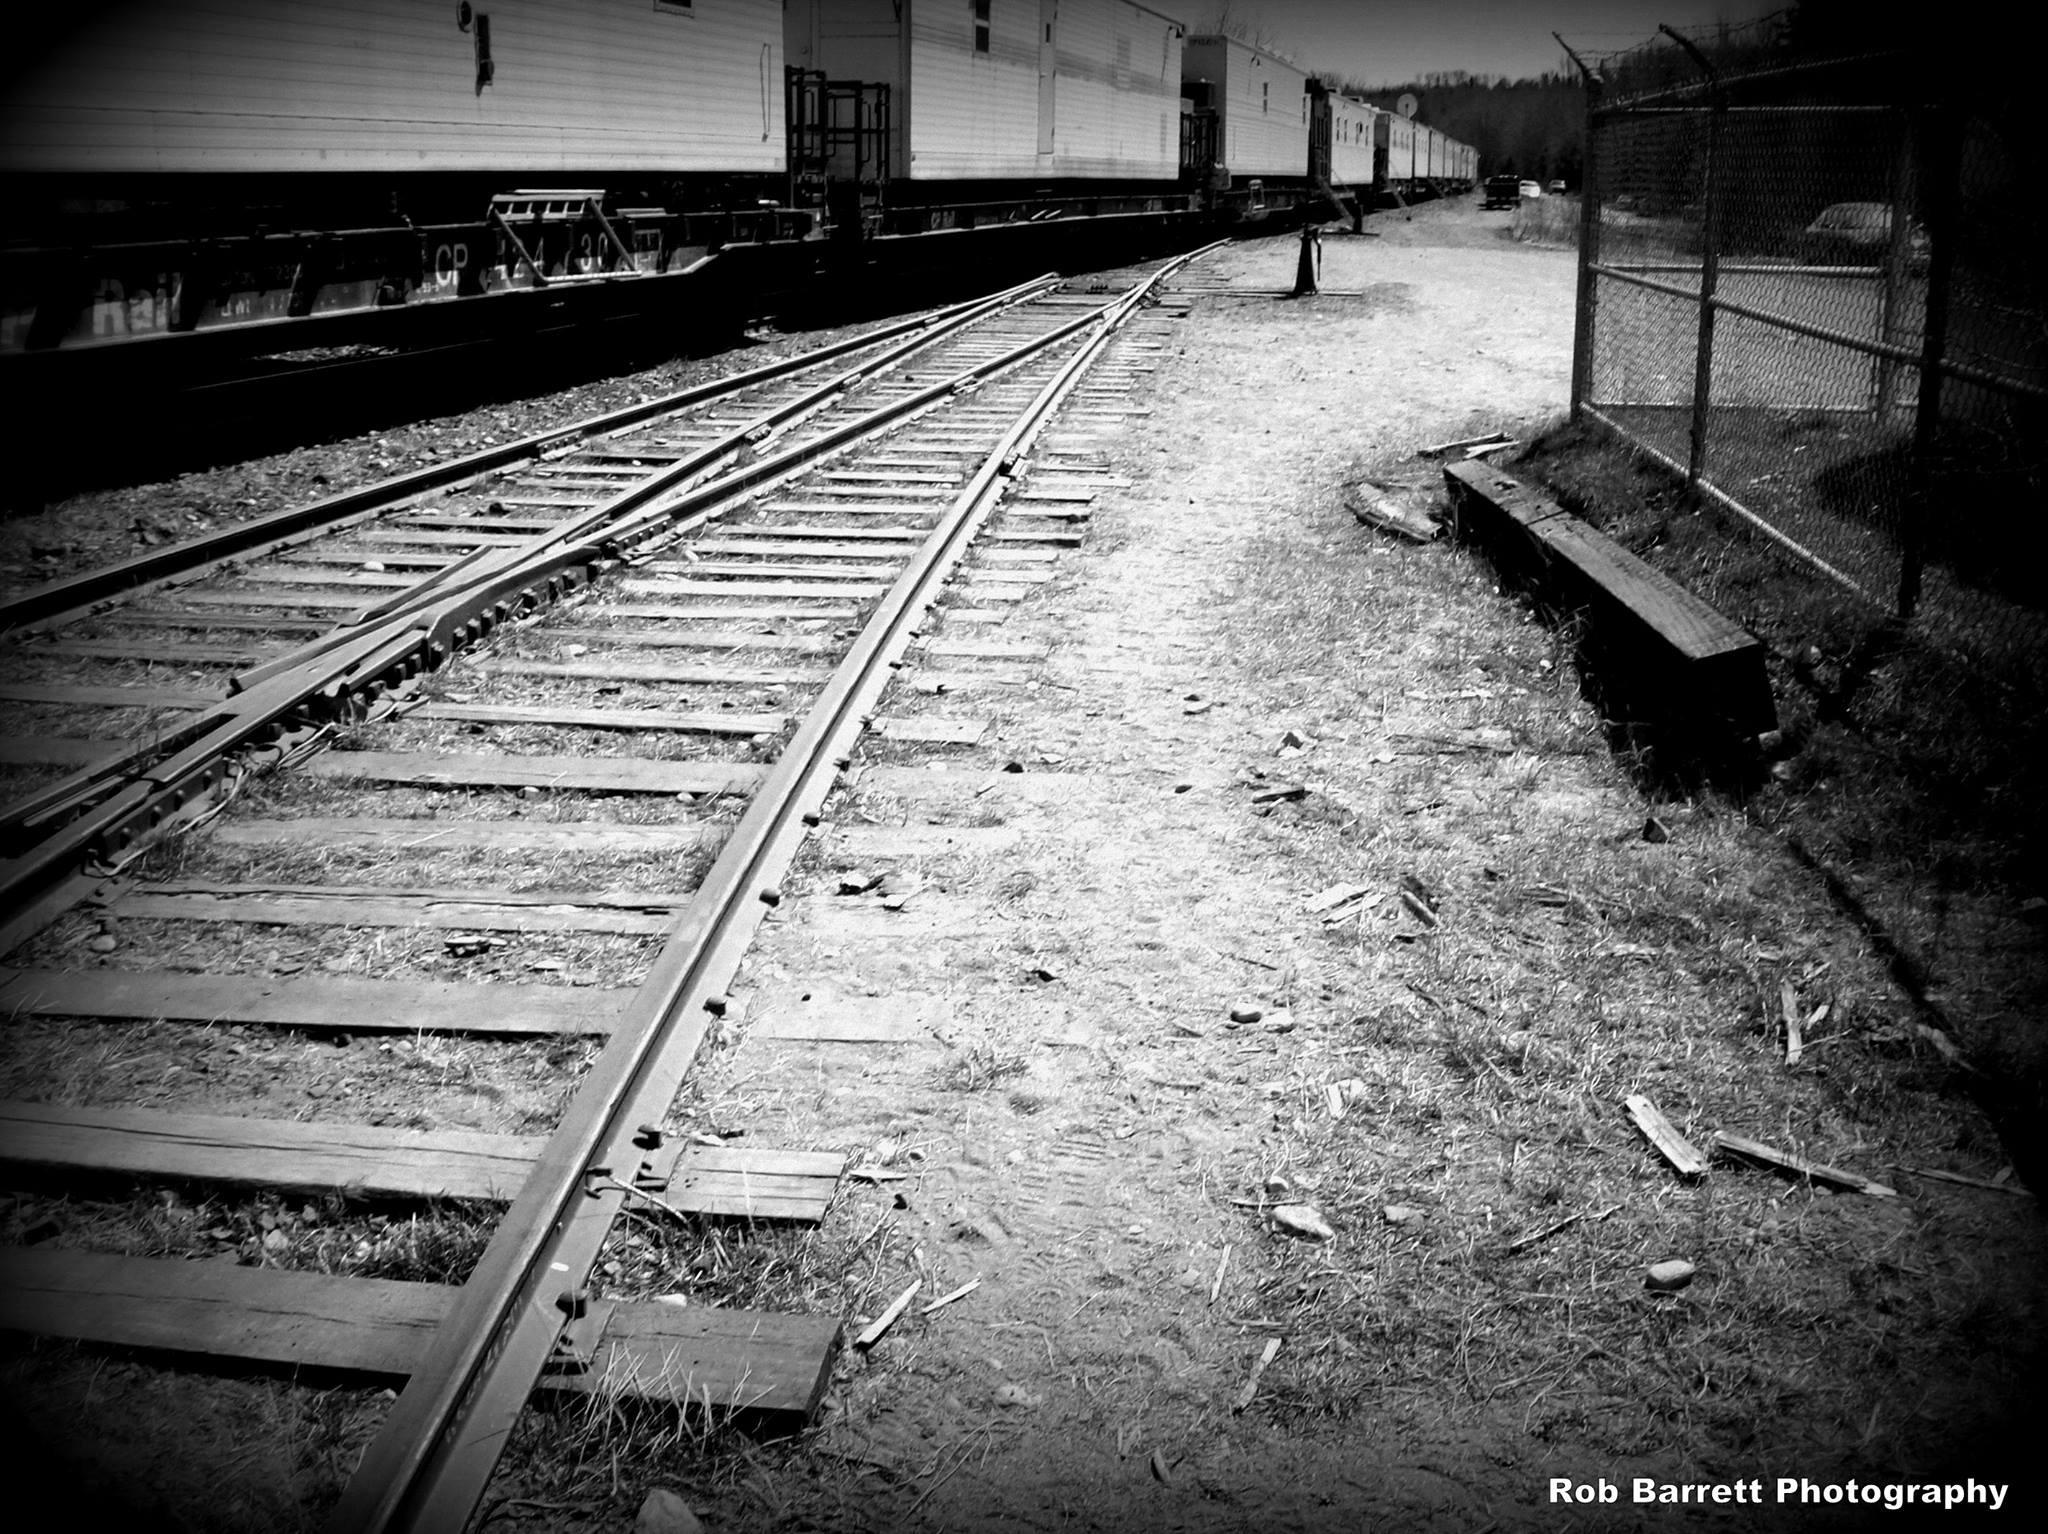 Railway Repair Crews by Rob Barrett Photography